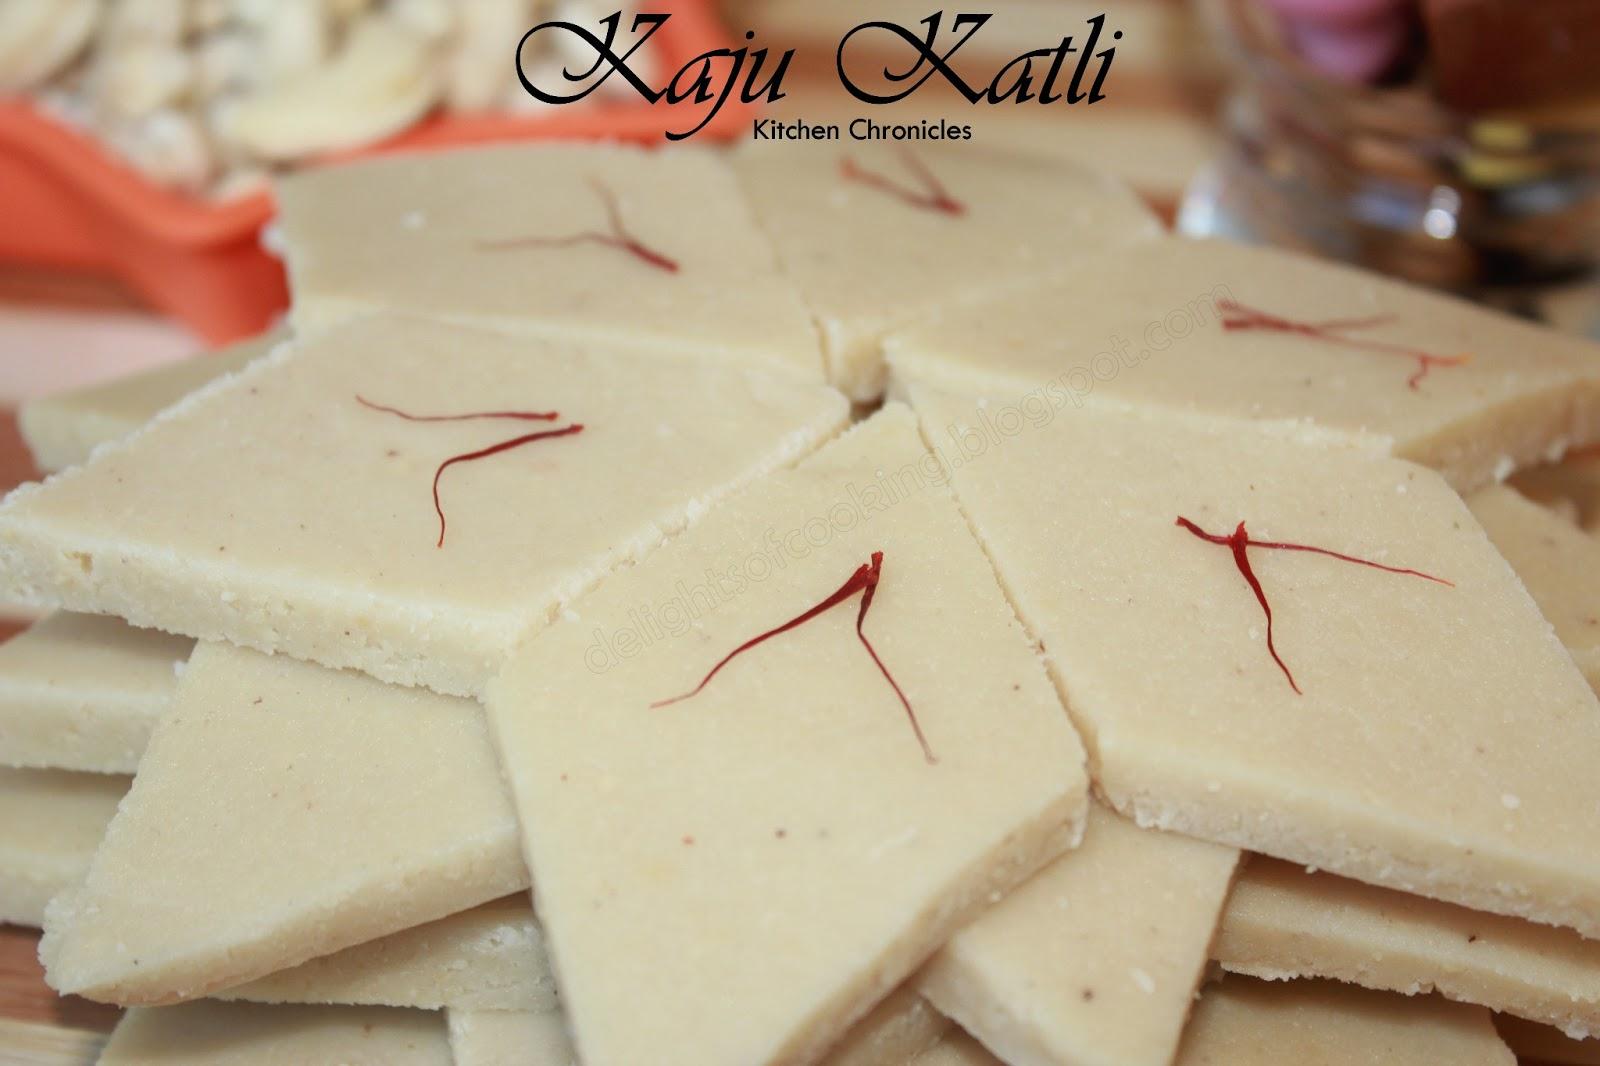 Kitchen Chronicles: Kaju Katli